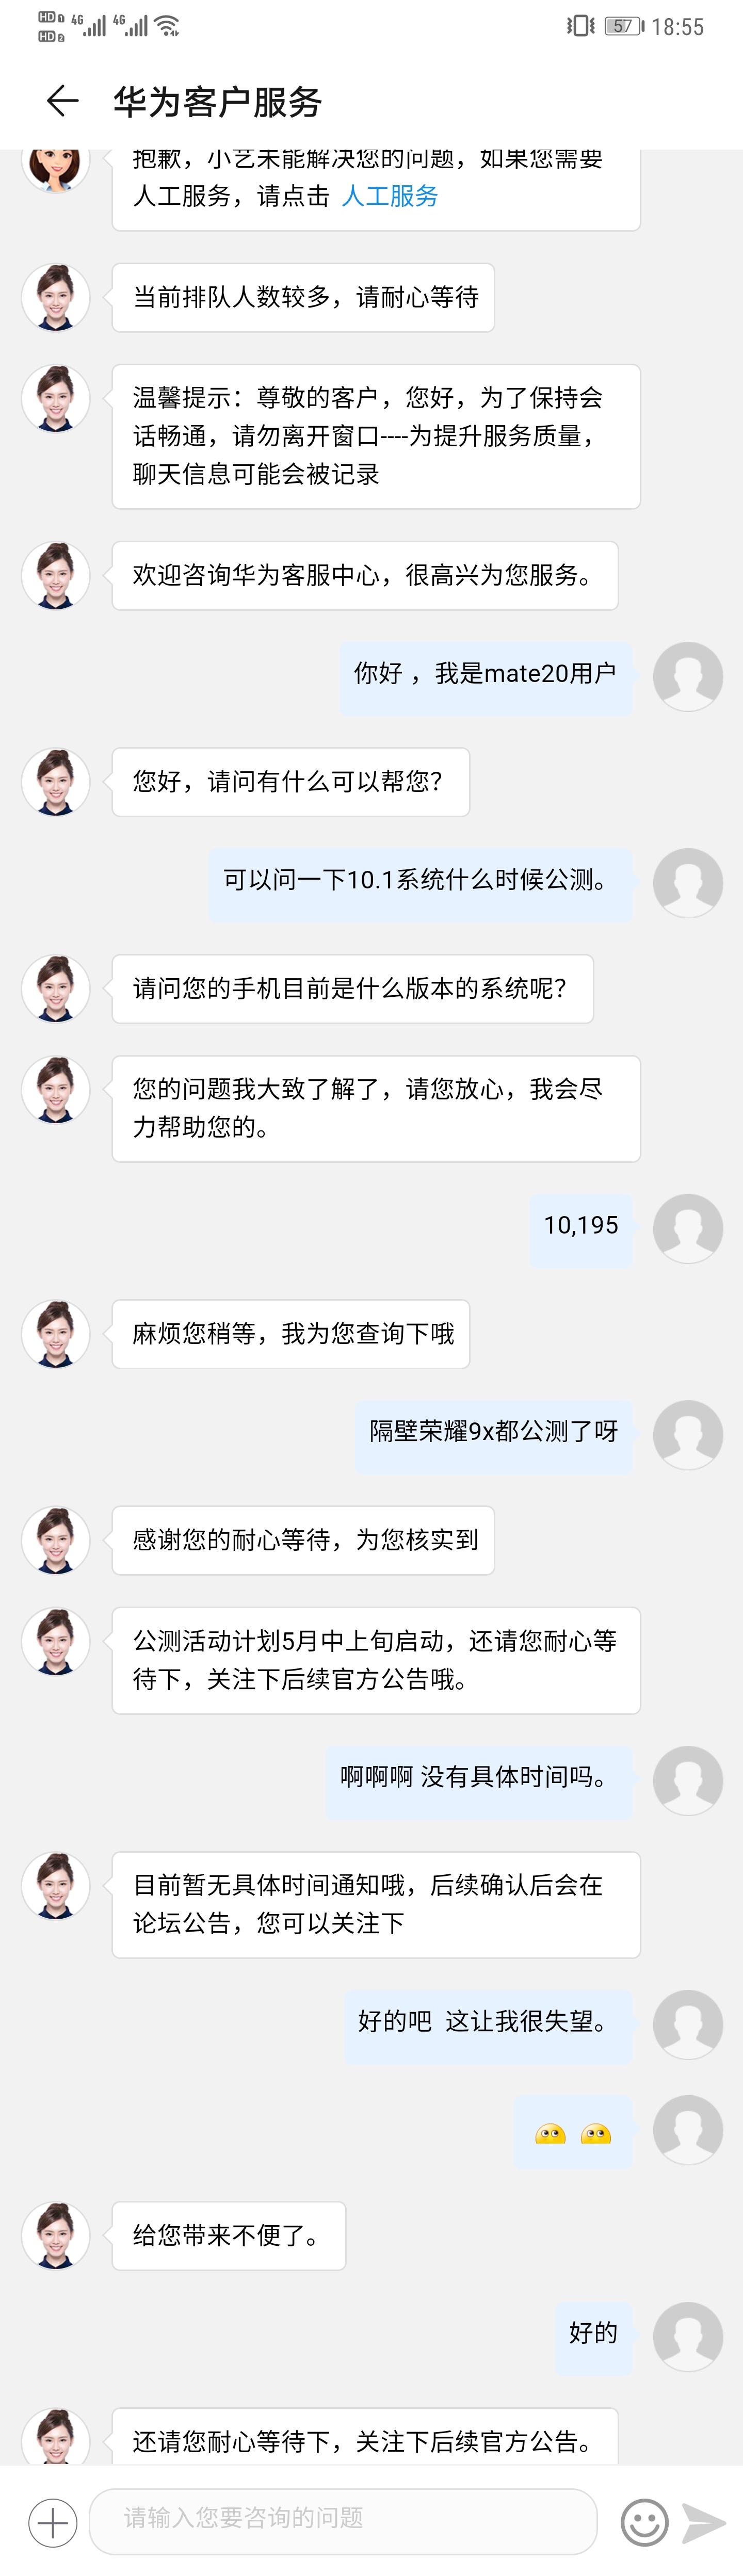 Screenshot_20200511_185520_com.huawei.phoneservice.jpg